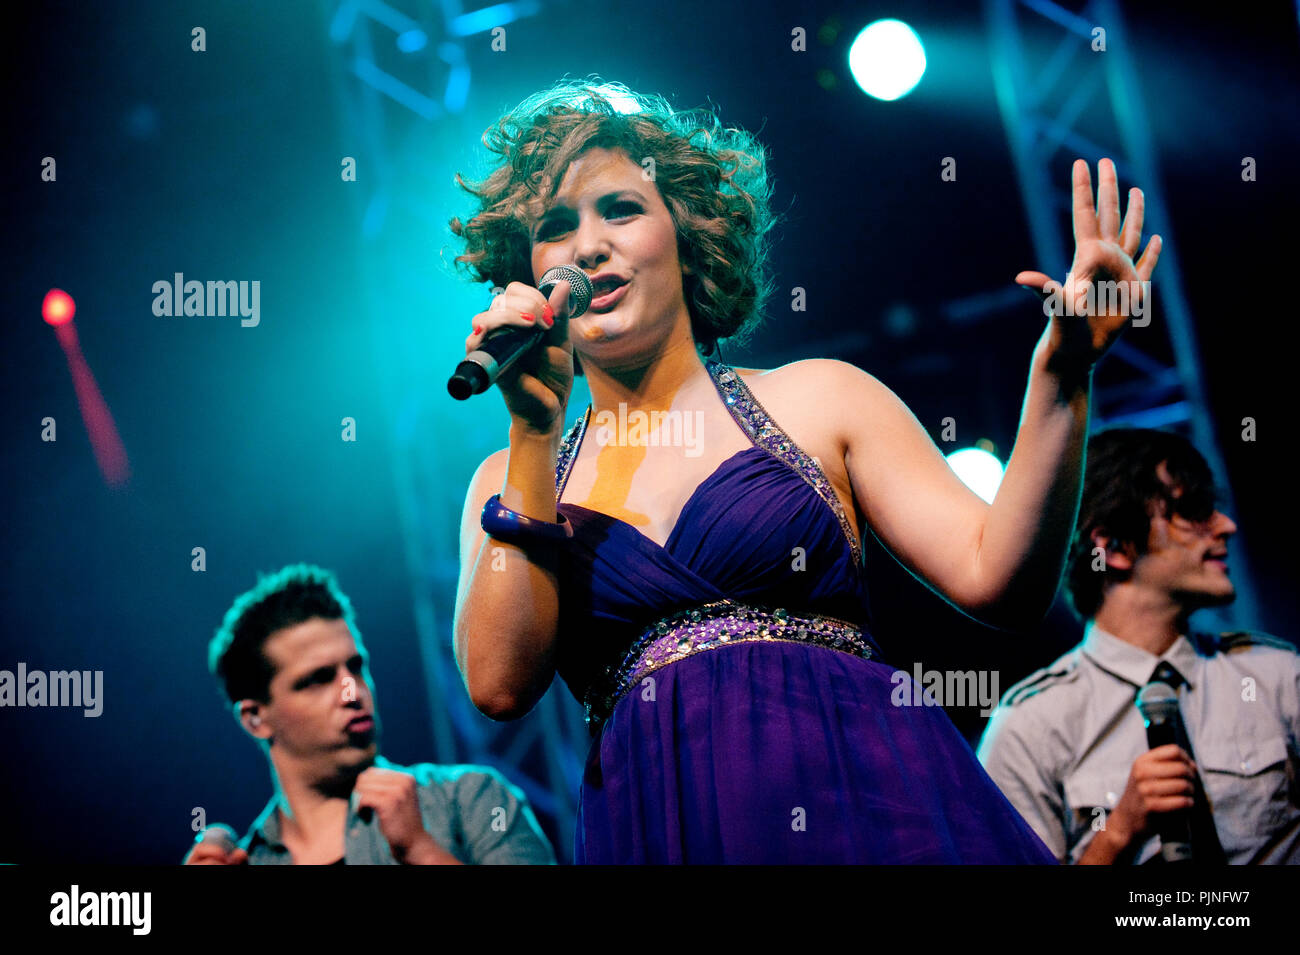 The Idool Live On Stage concert in the Lotto Arena, Antwerp (Belgium, 25/06/2011) Stock Photo